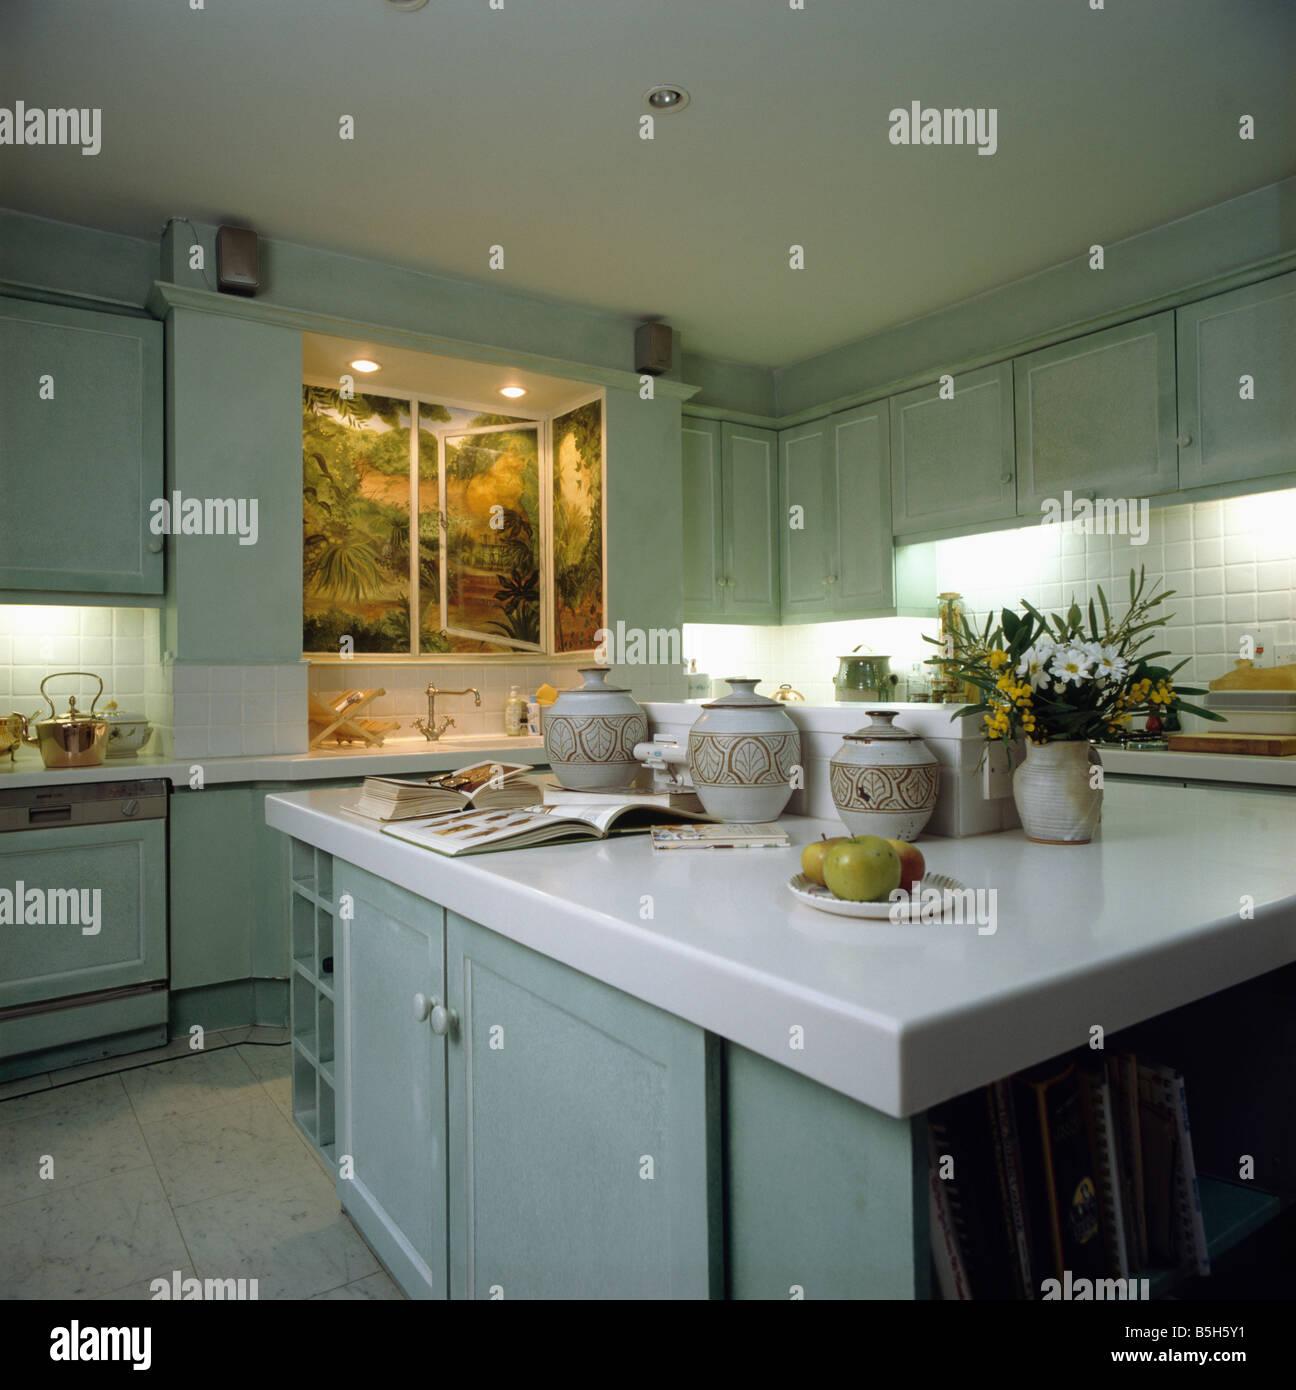 Lighted trompe l\'oeil landscape above sink in modern pale ...